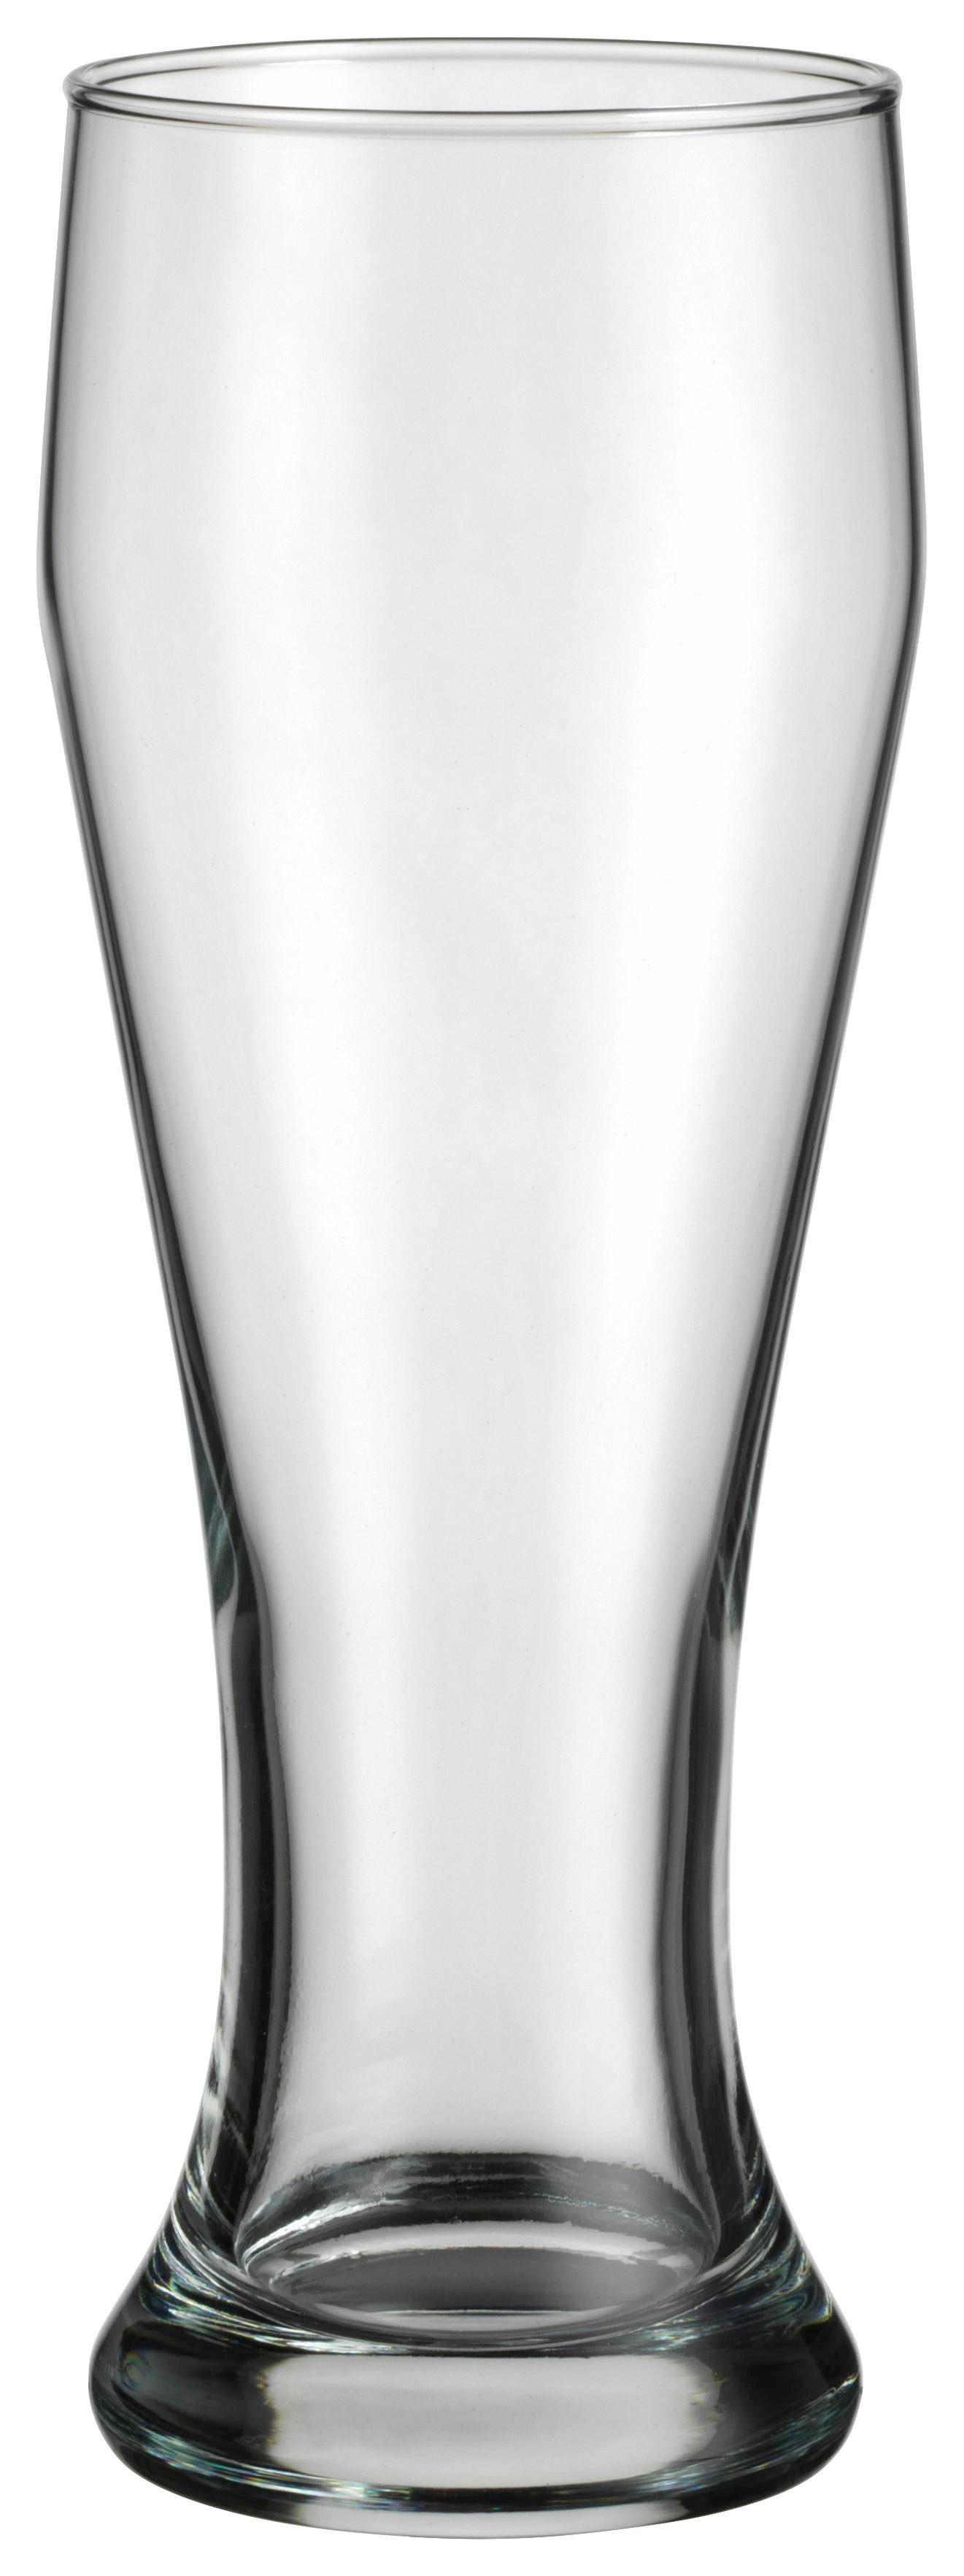 VETEÖLGLAS - transparent, Basics, glas (0,5l) - Homeware